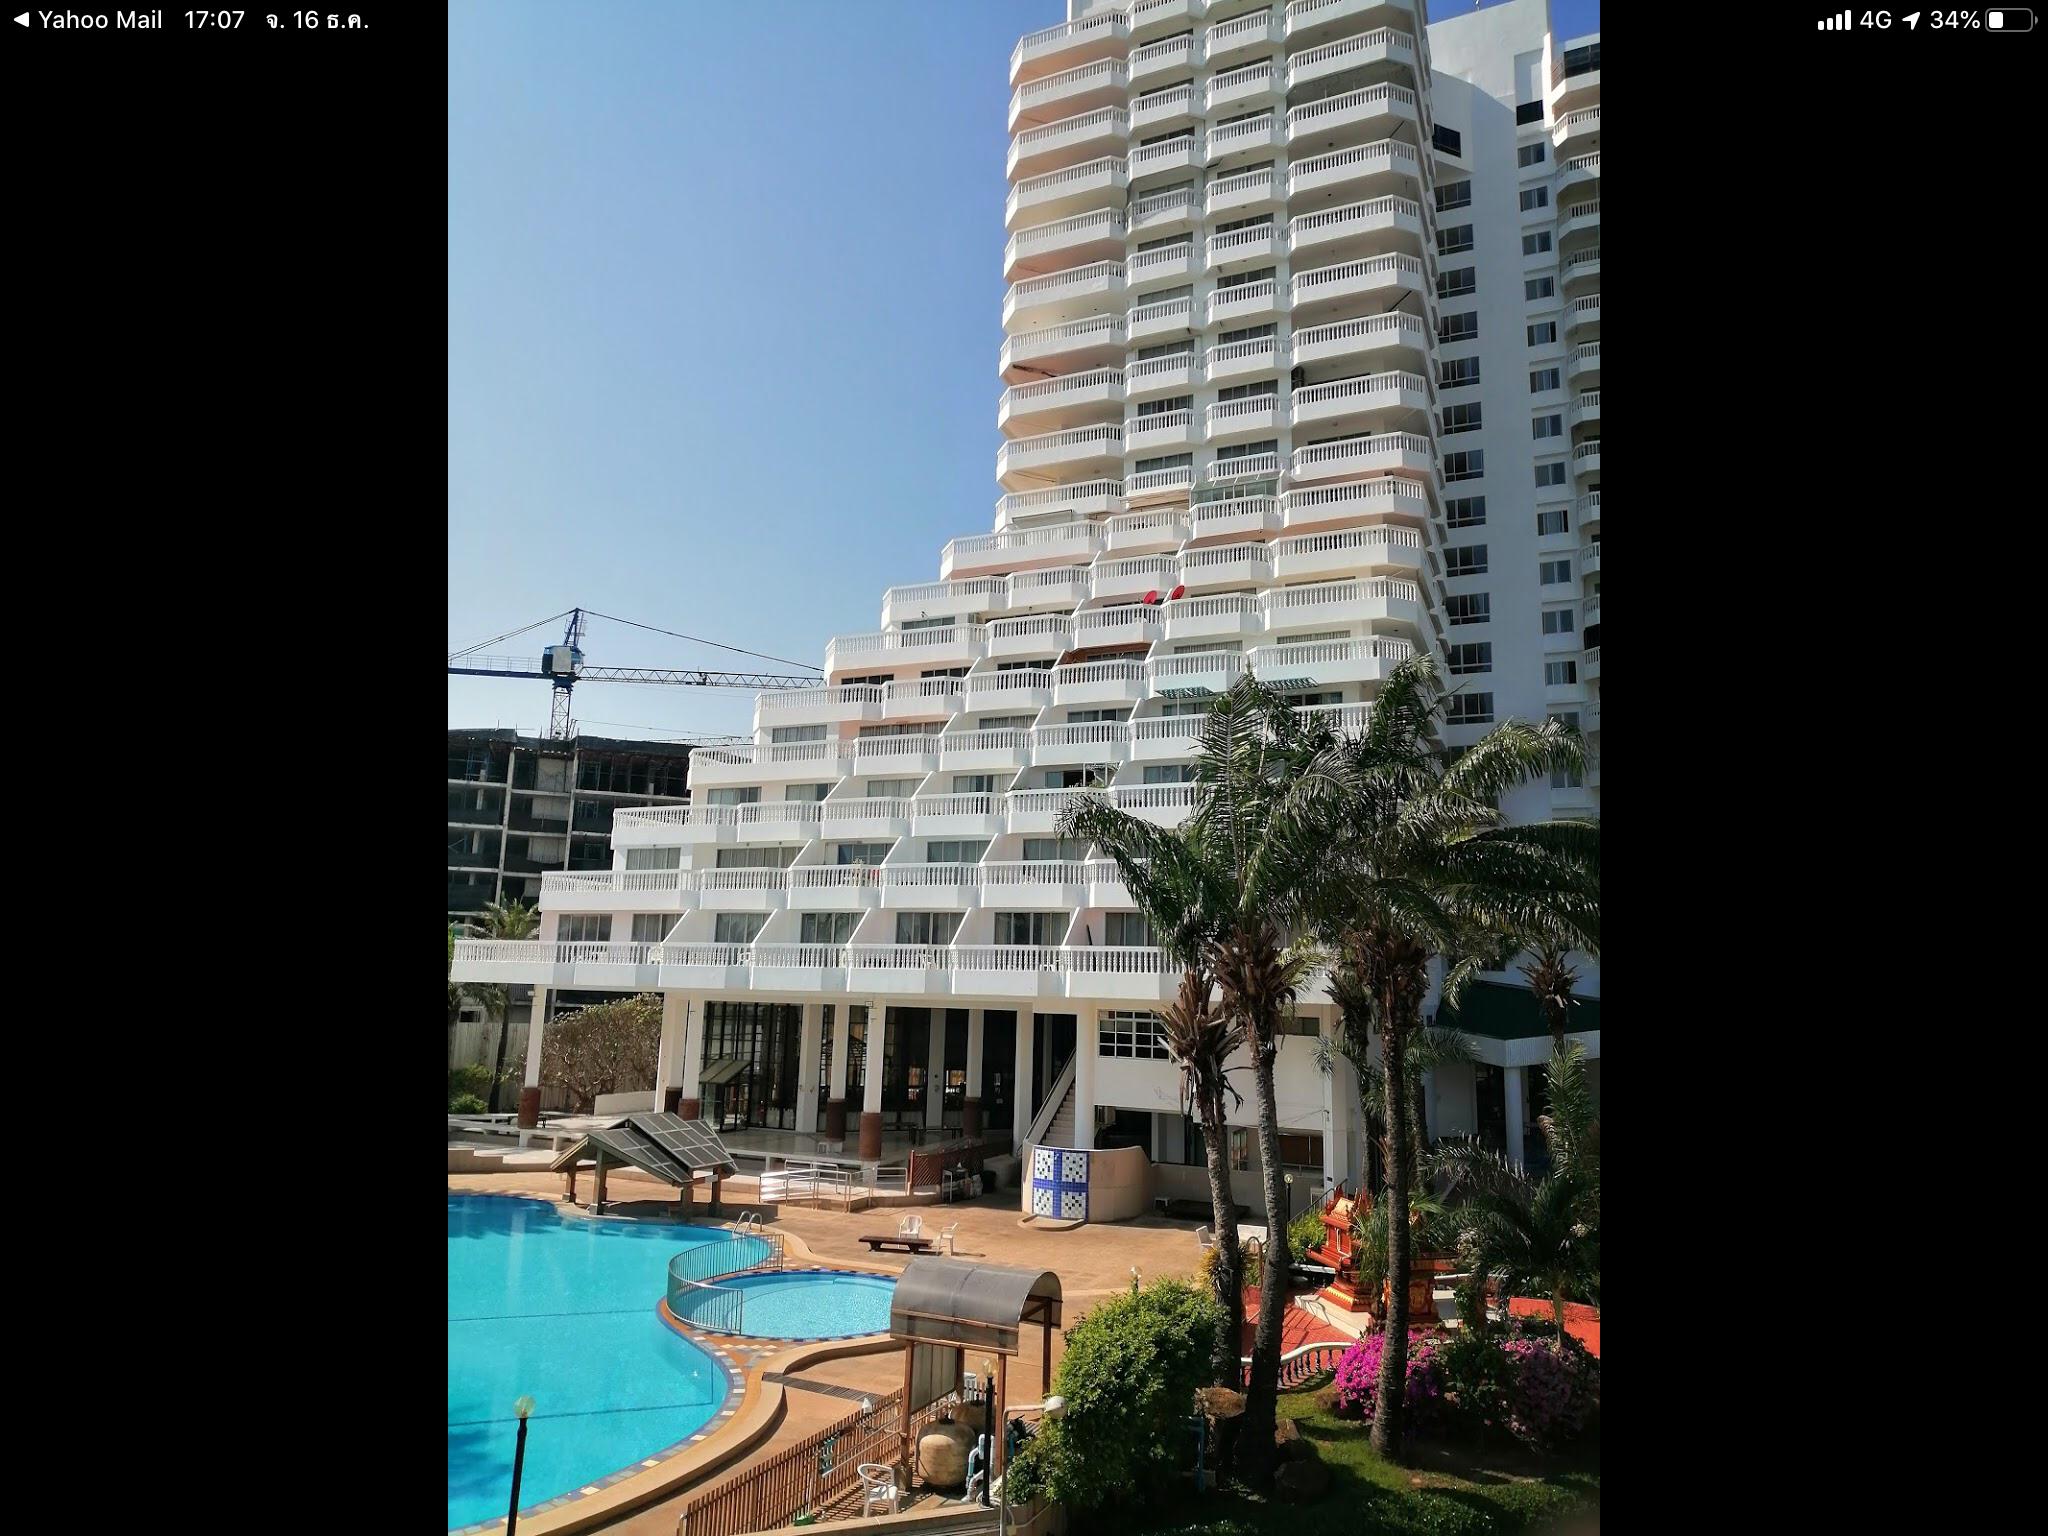 PMY Beach Resort อพาร์ตเมนต์ 1 ห้องนอน 1 ห้องน้ำส่วนตัว ขนาด 44 ตร.ม. – หาดระยอง